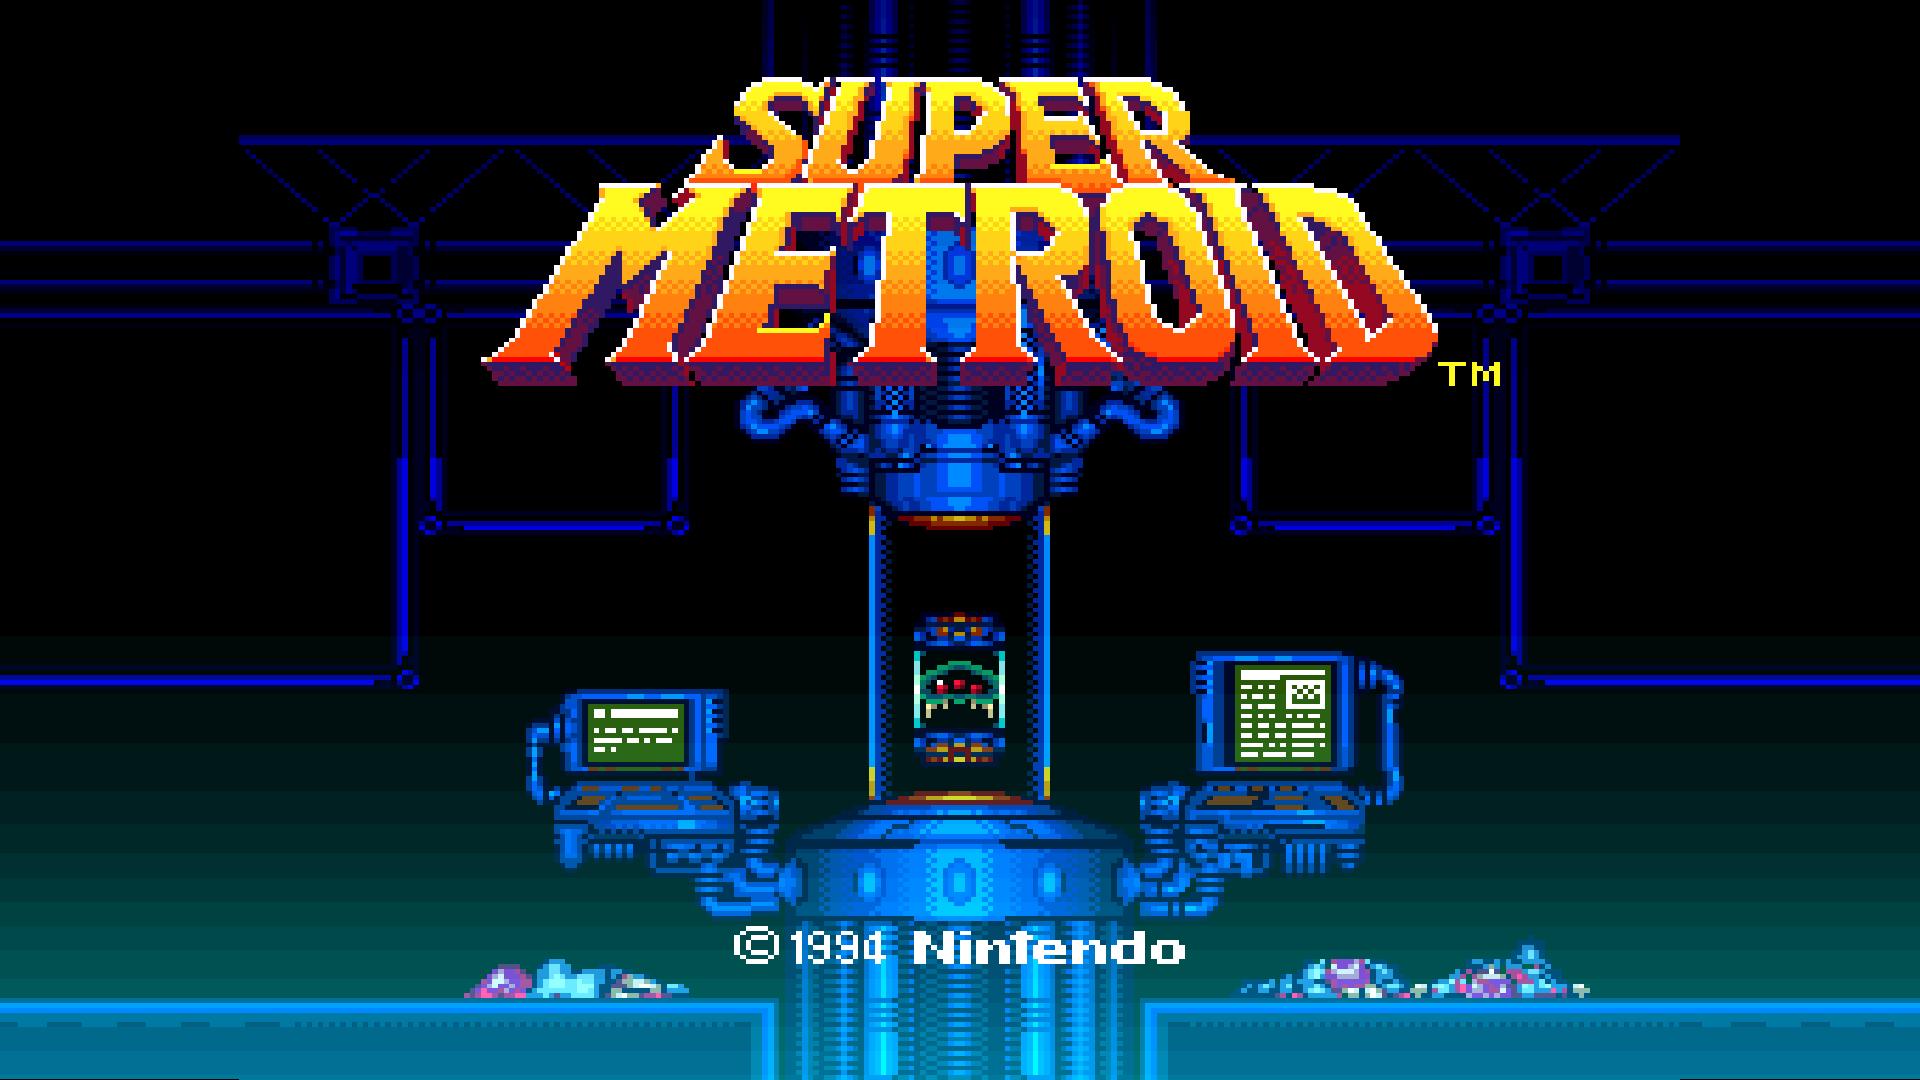 Super Metroid Wallpaper 1920x1080